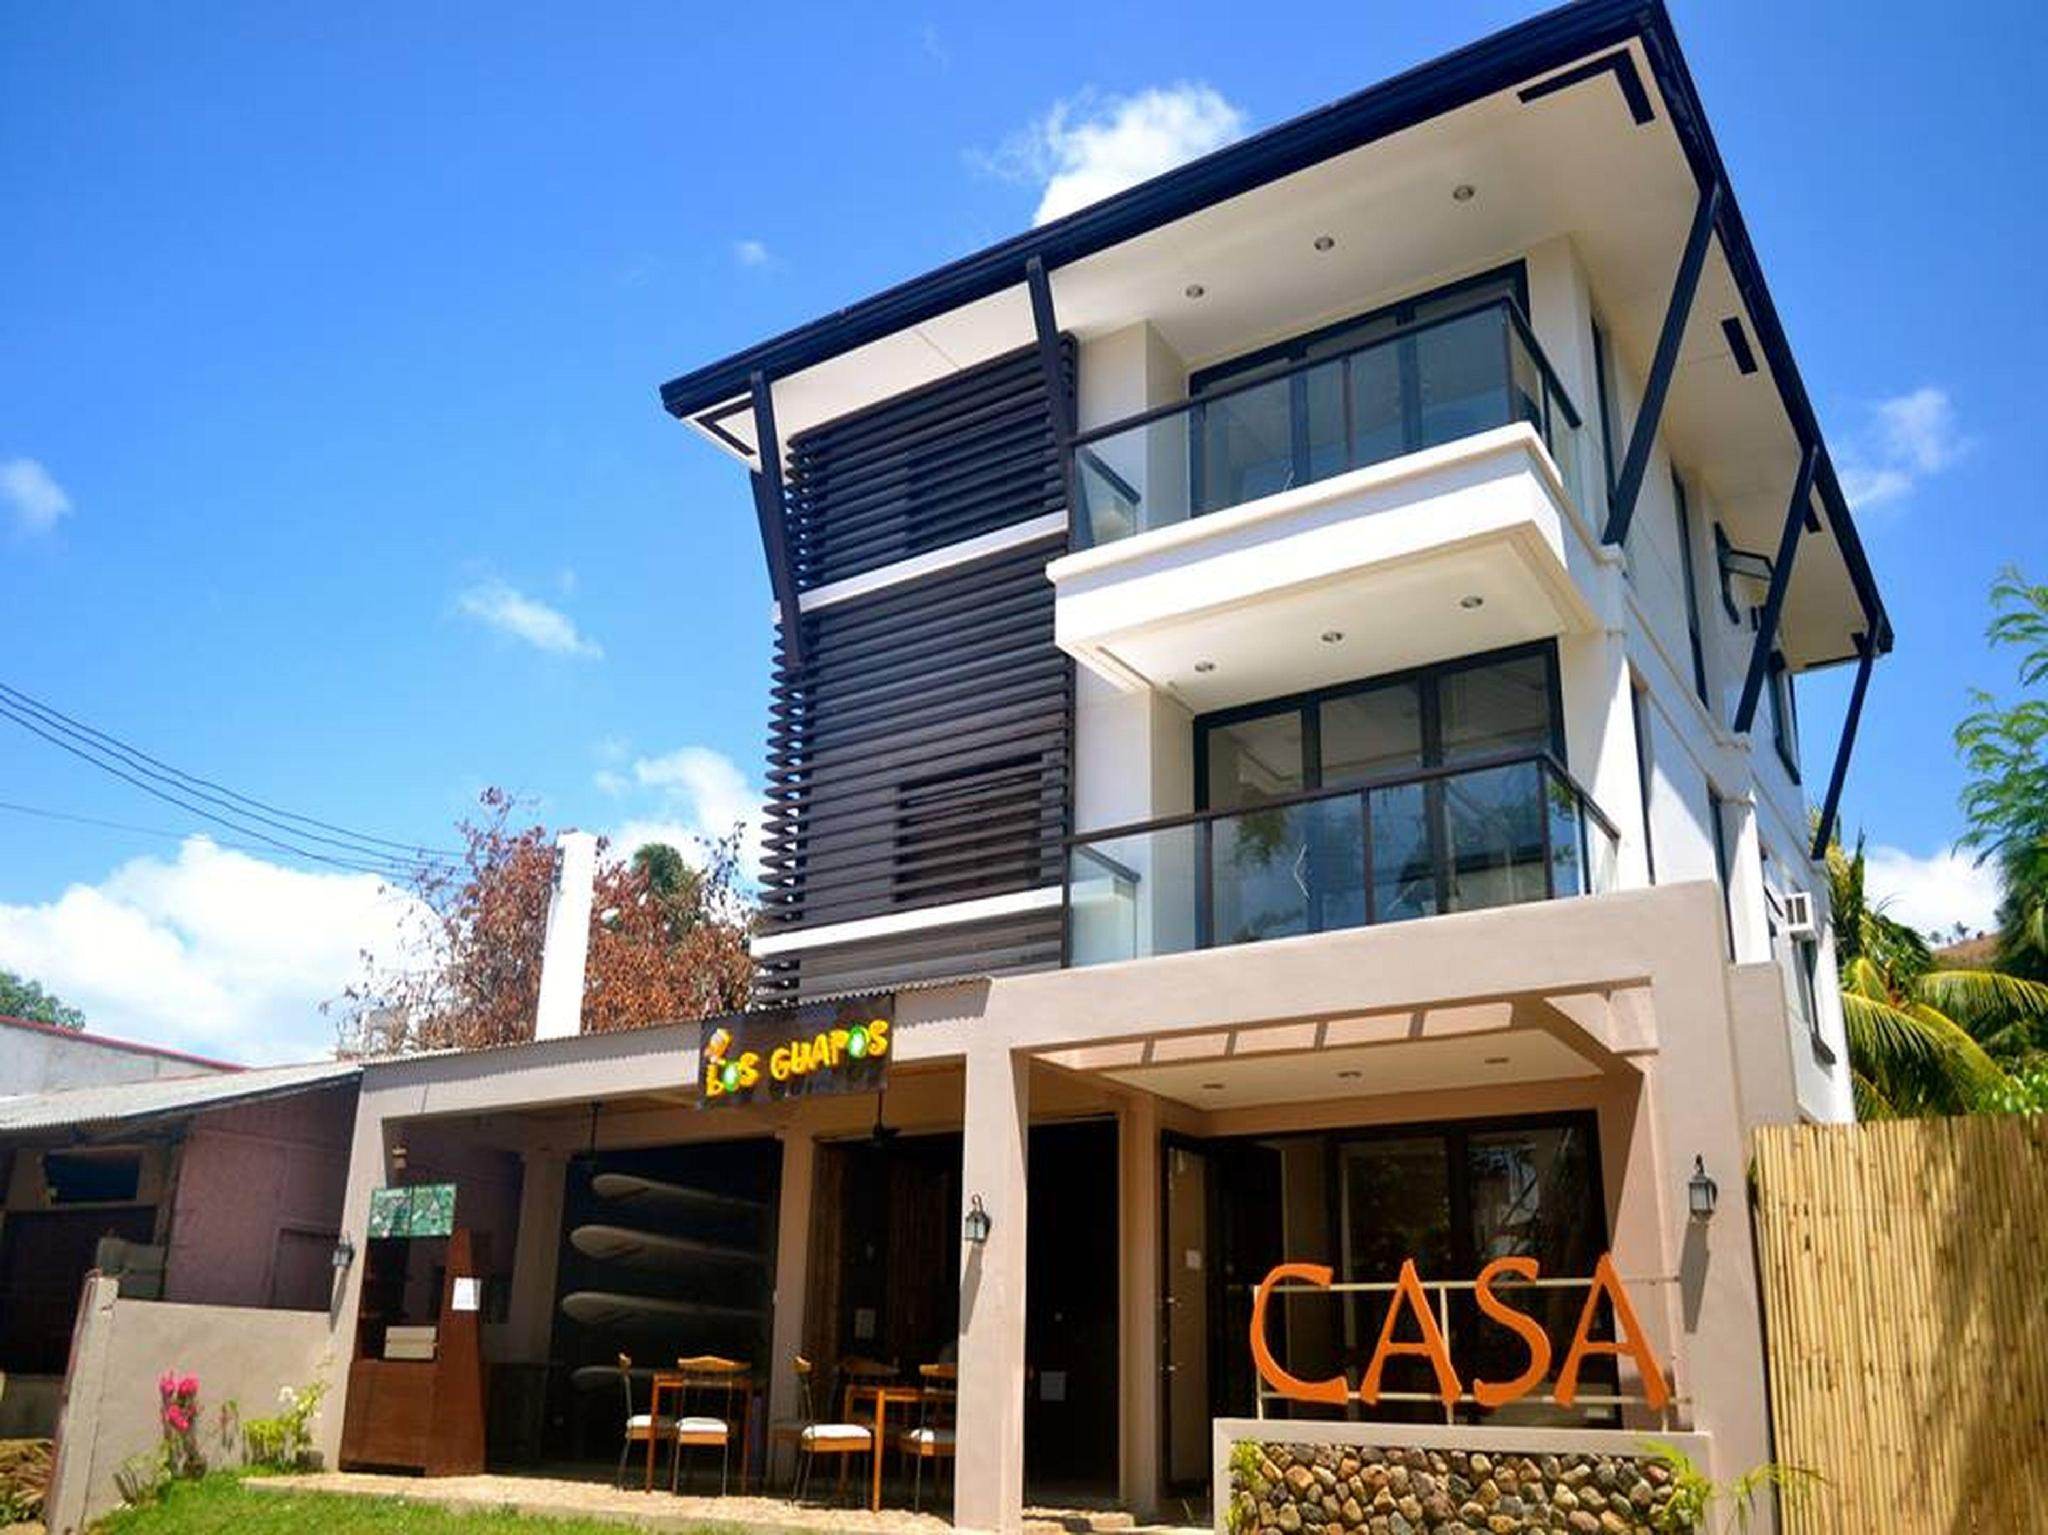 Coron Casa Hotel